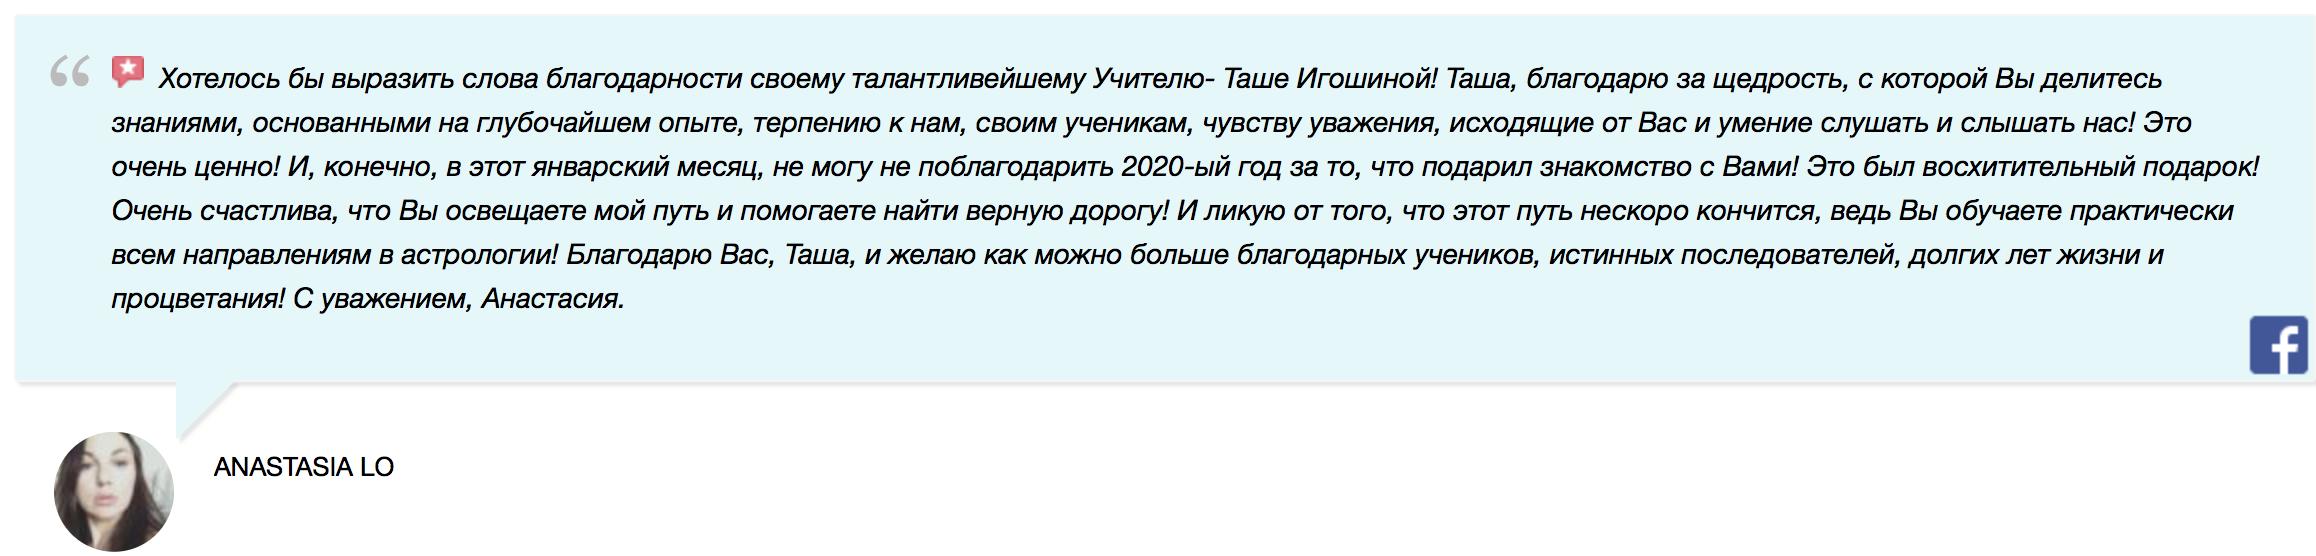 https://astrologtasha.ru/wp-content/uploads/2021/02/Screen-Shot-2021-02-09-at-10.34.53-PM.png